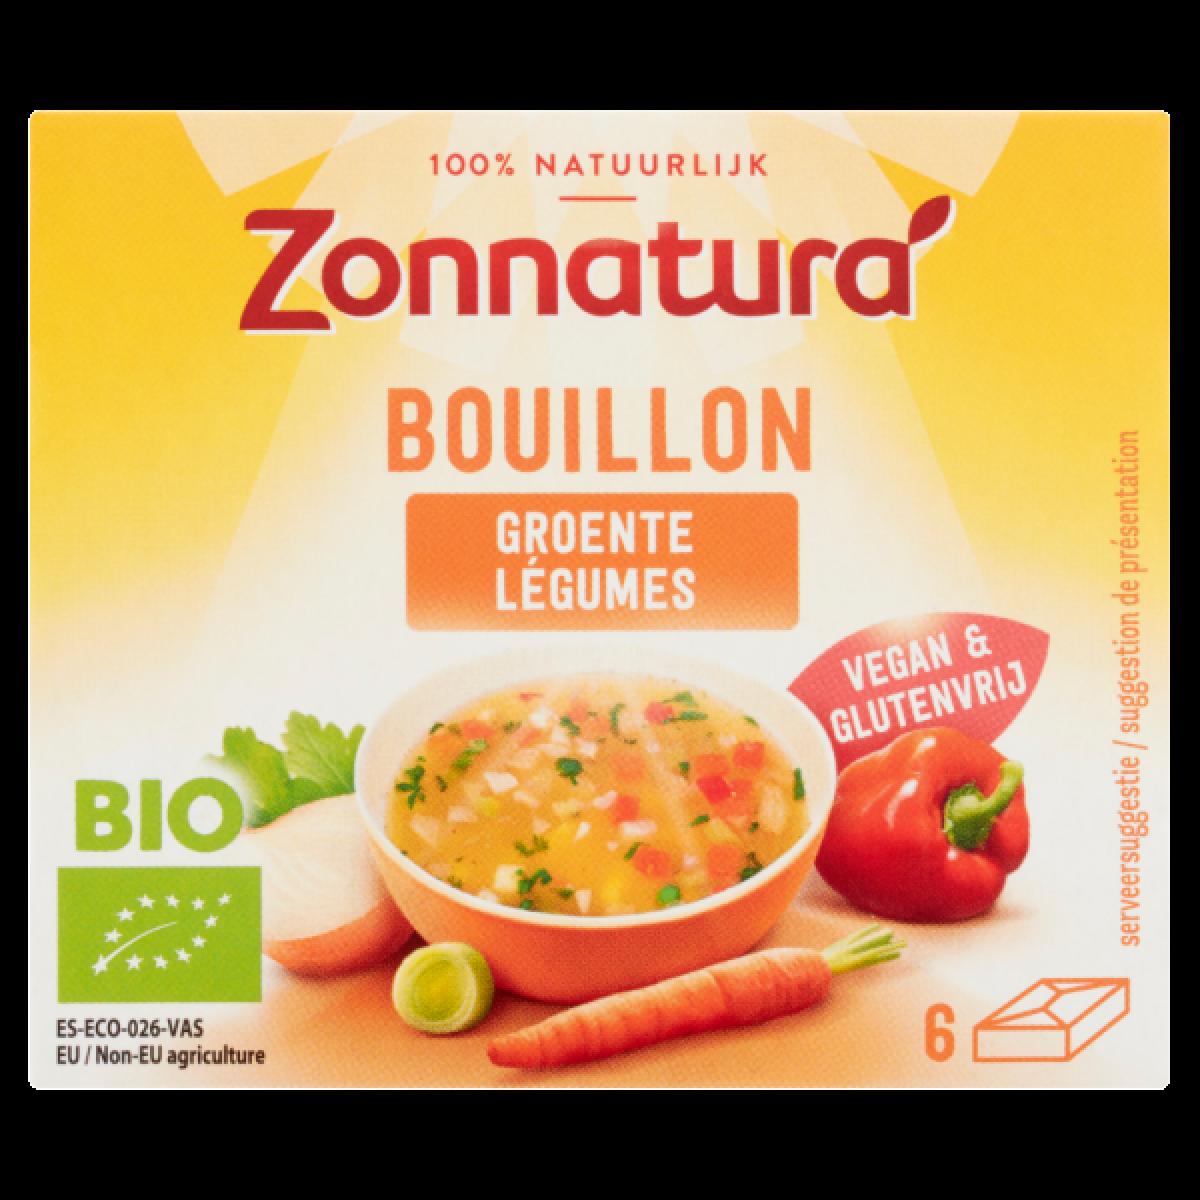 Bouillon Groente